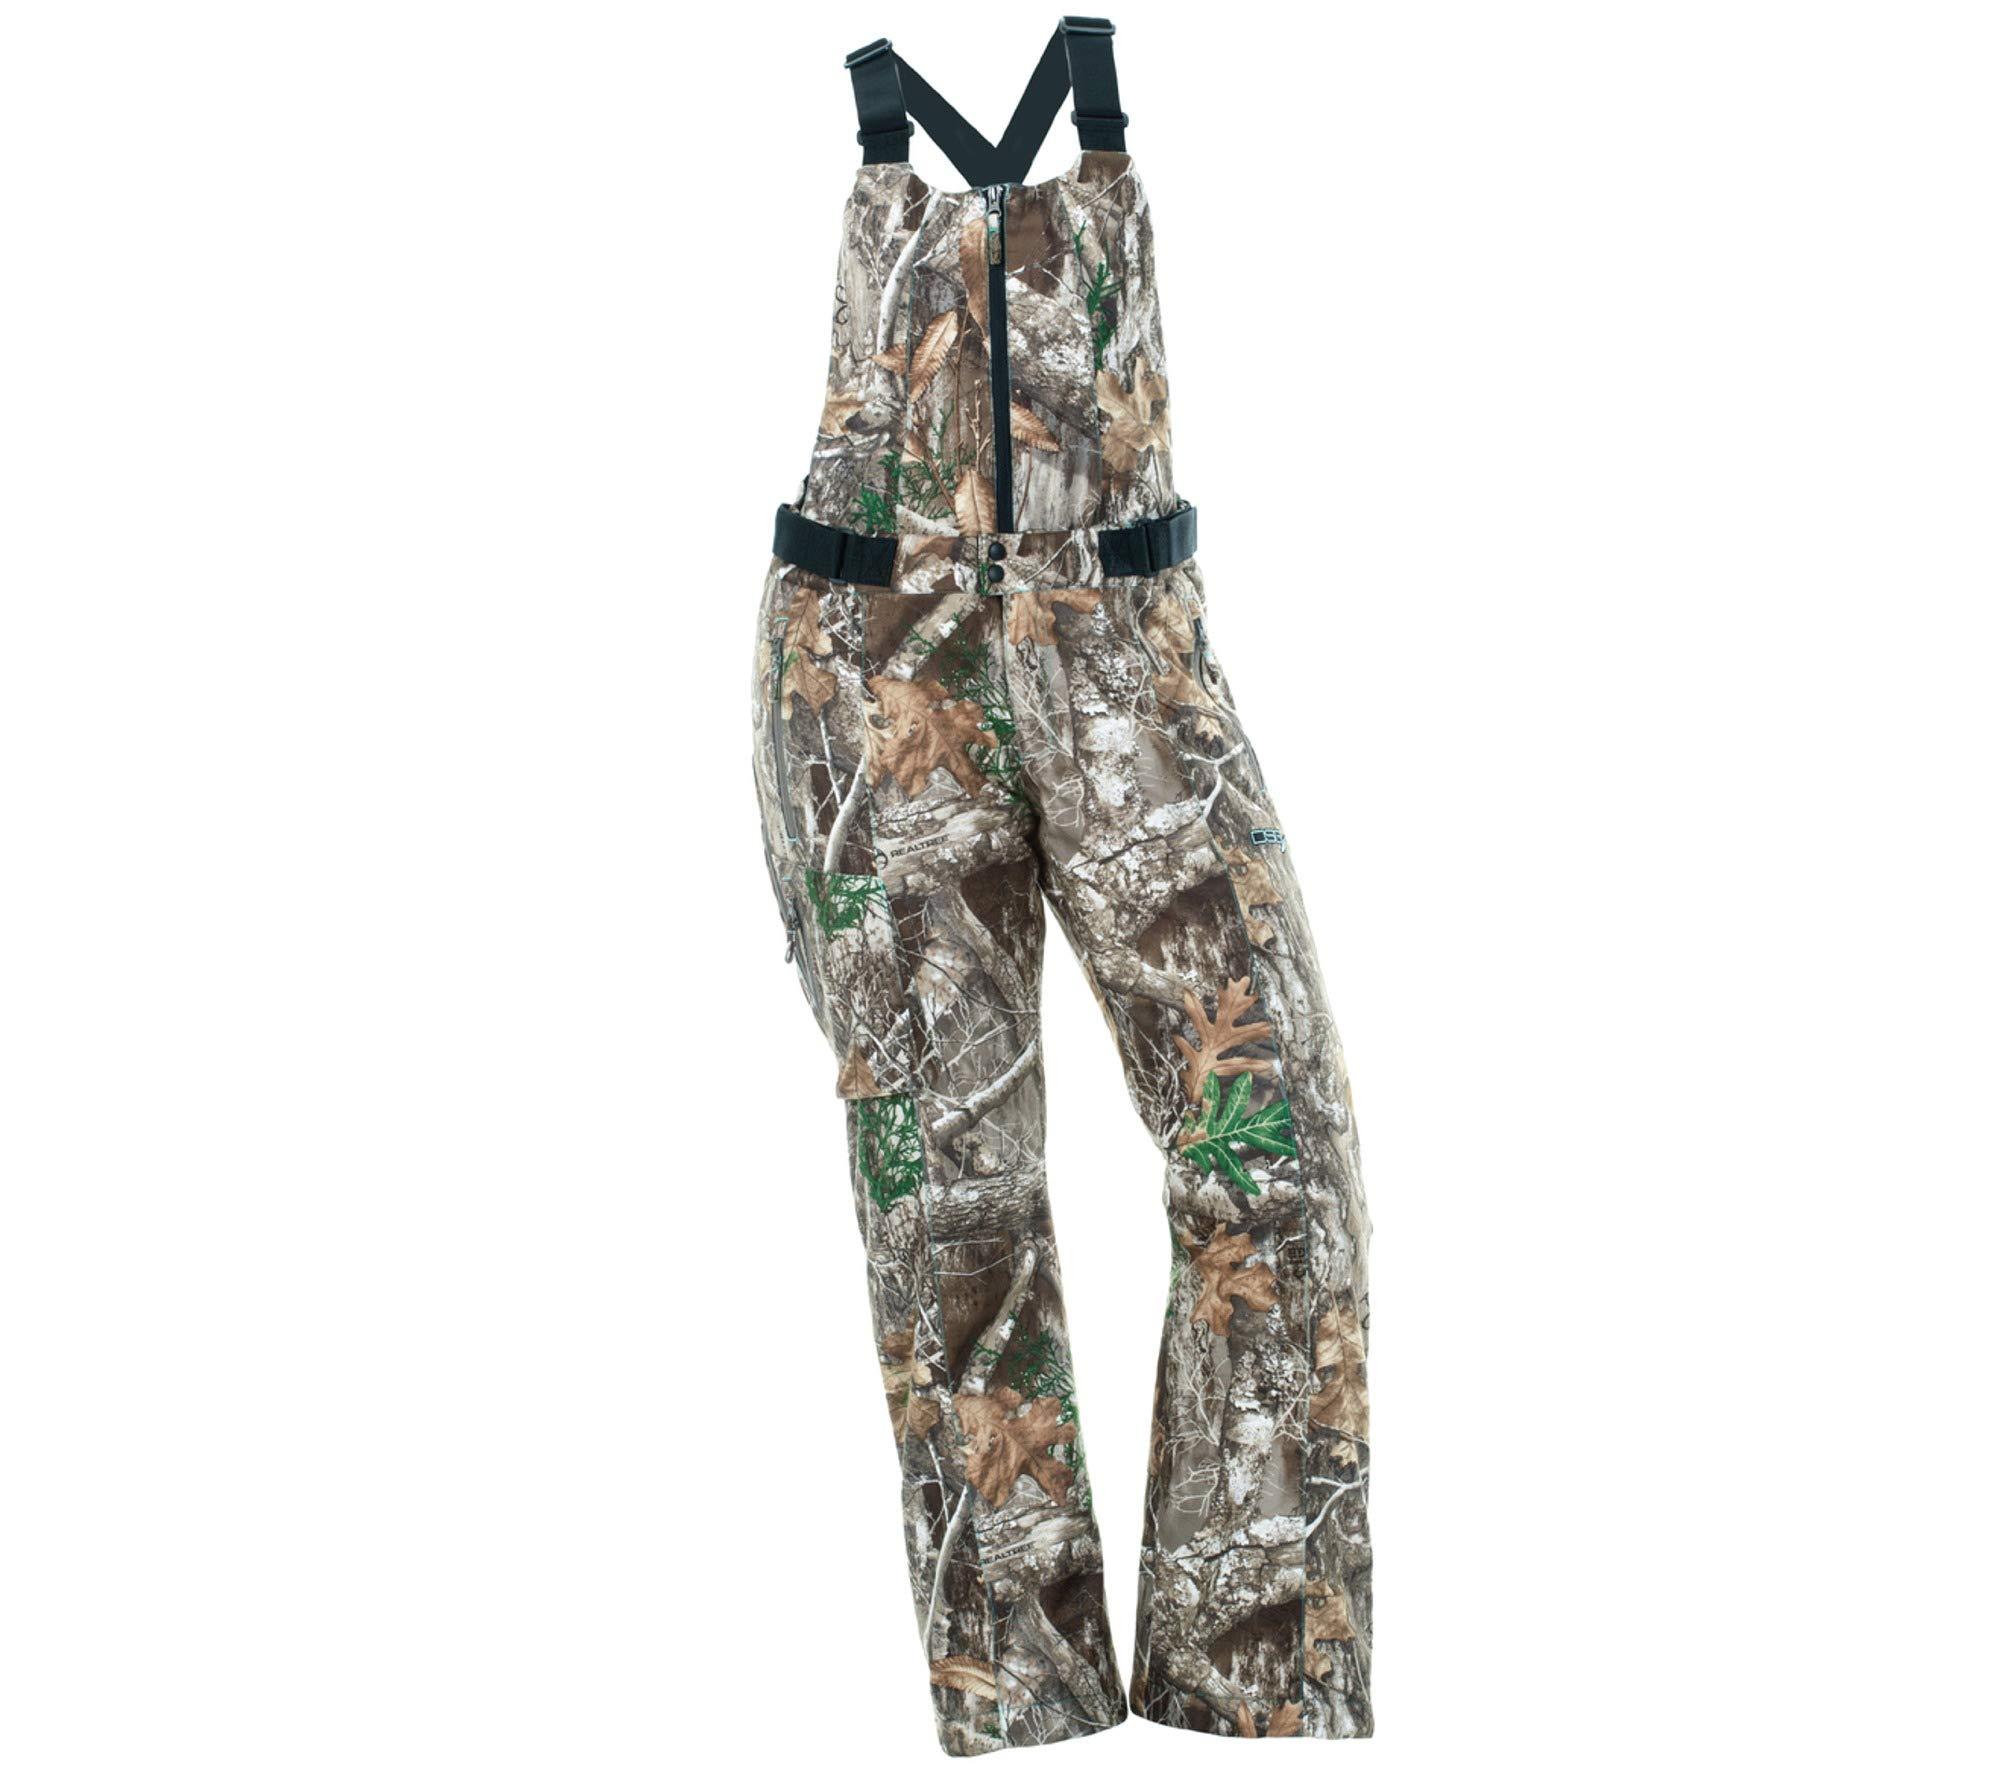 DSG Outerwear Women's Hunting Kylie 3.0 Drop-Seat Bib (Realtree Edge, 5XL) by DSG Outerwear